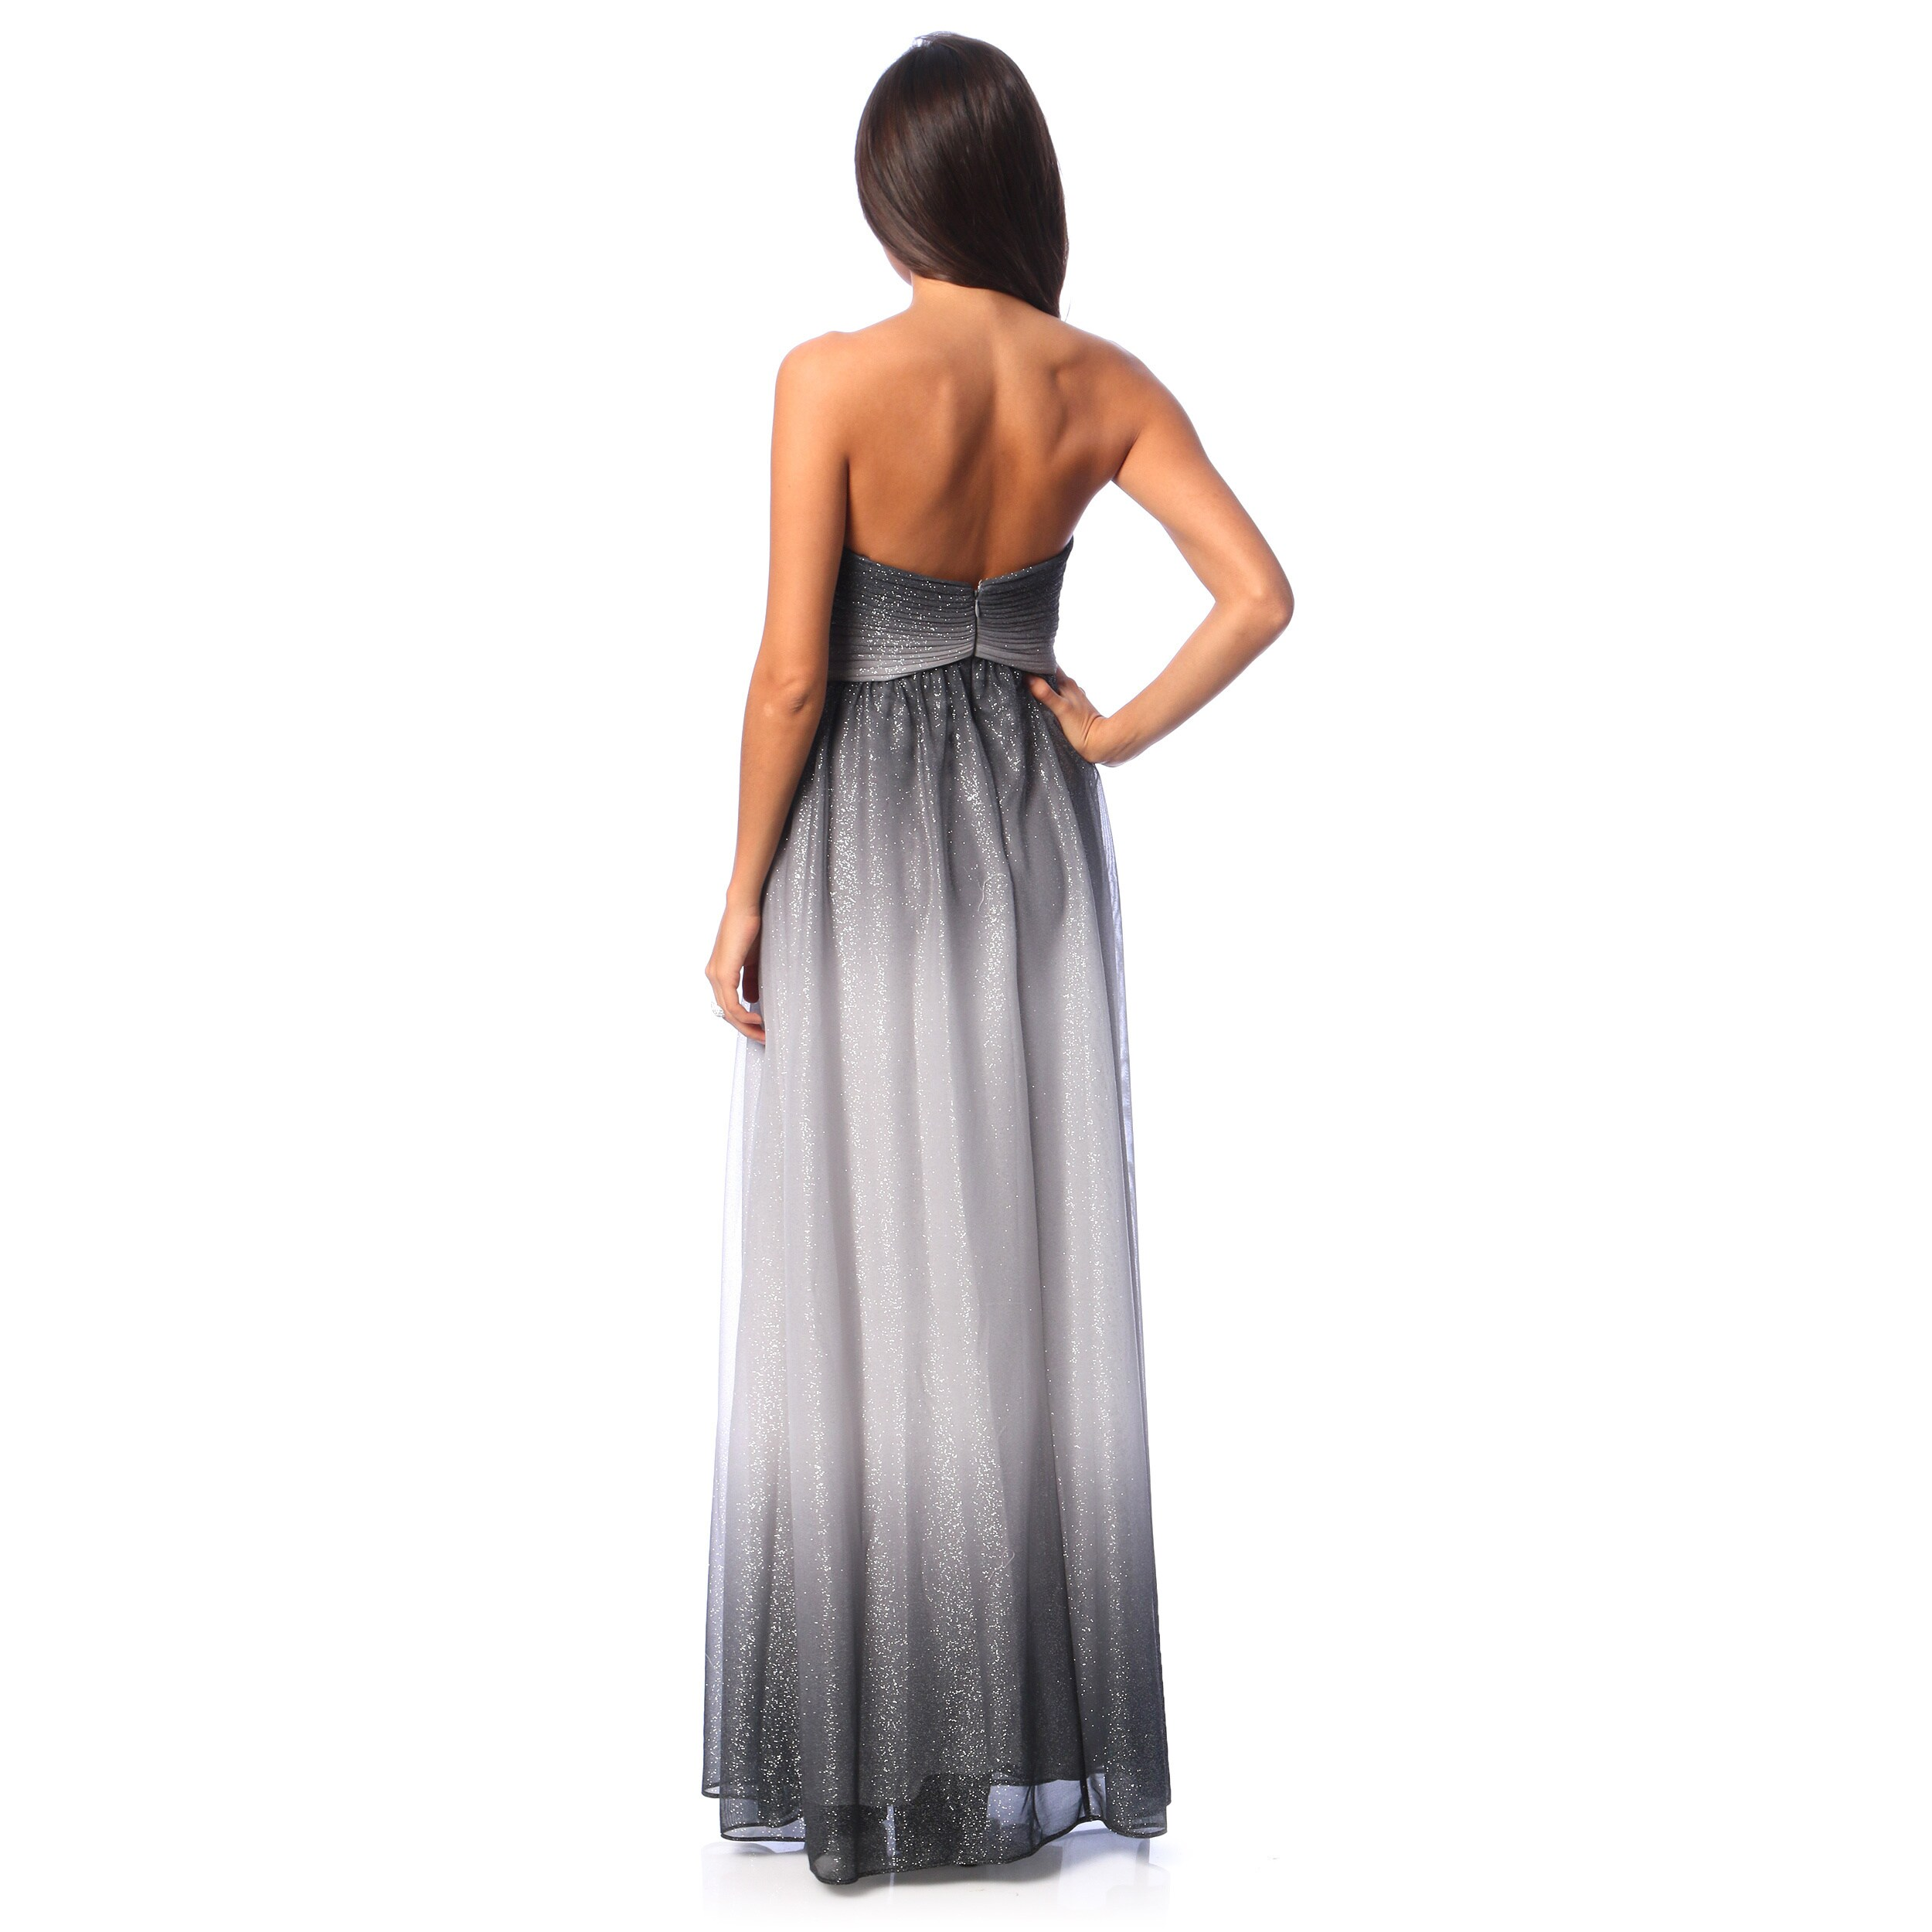 3847ac43333c Shop Cachet Women's Gunmetal Sleeveless Glitter Mesh Gown - Free Shipping  Today - Overstock - 8822260